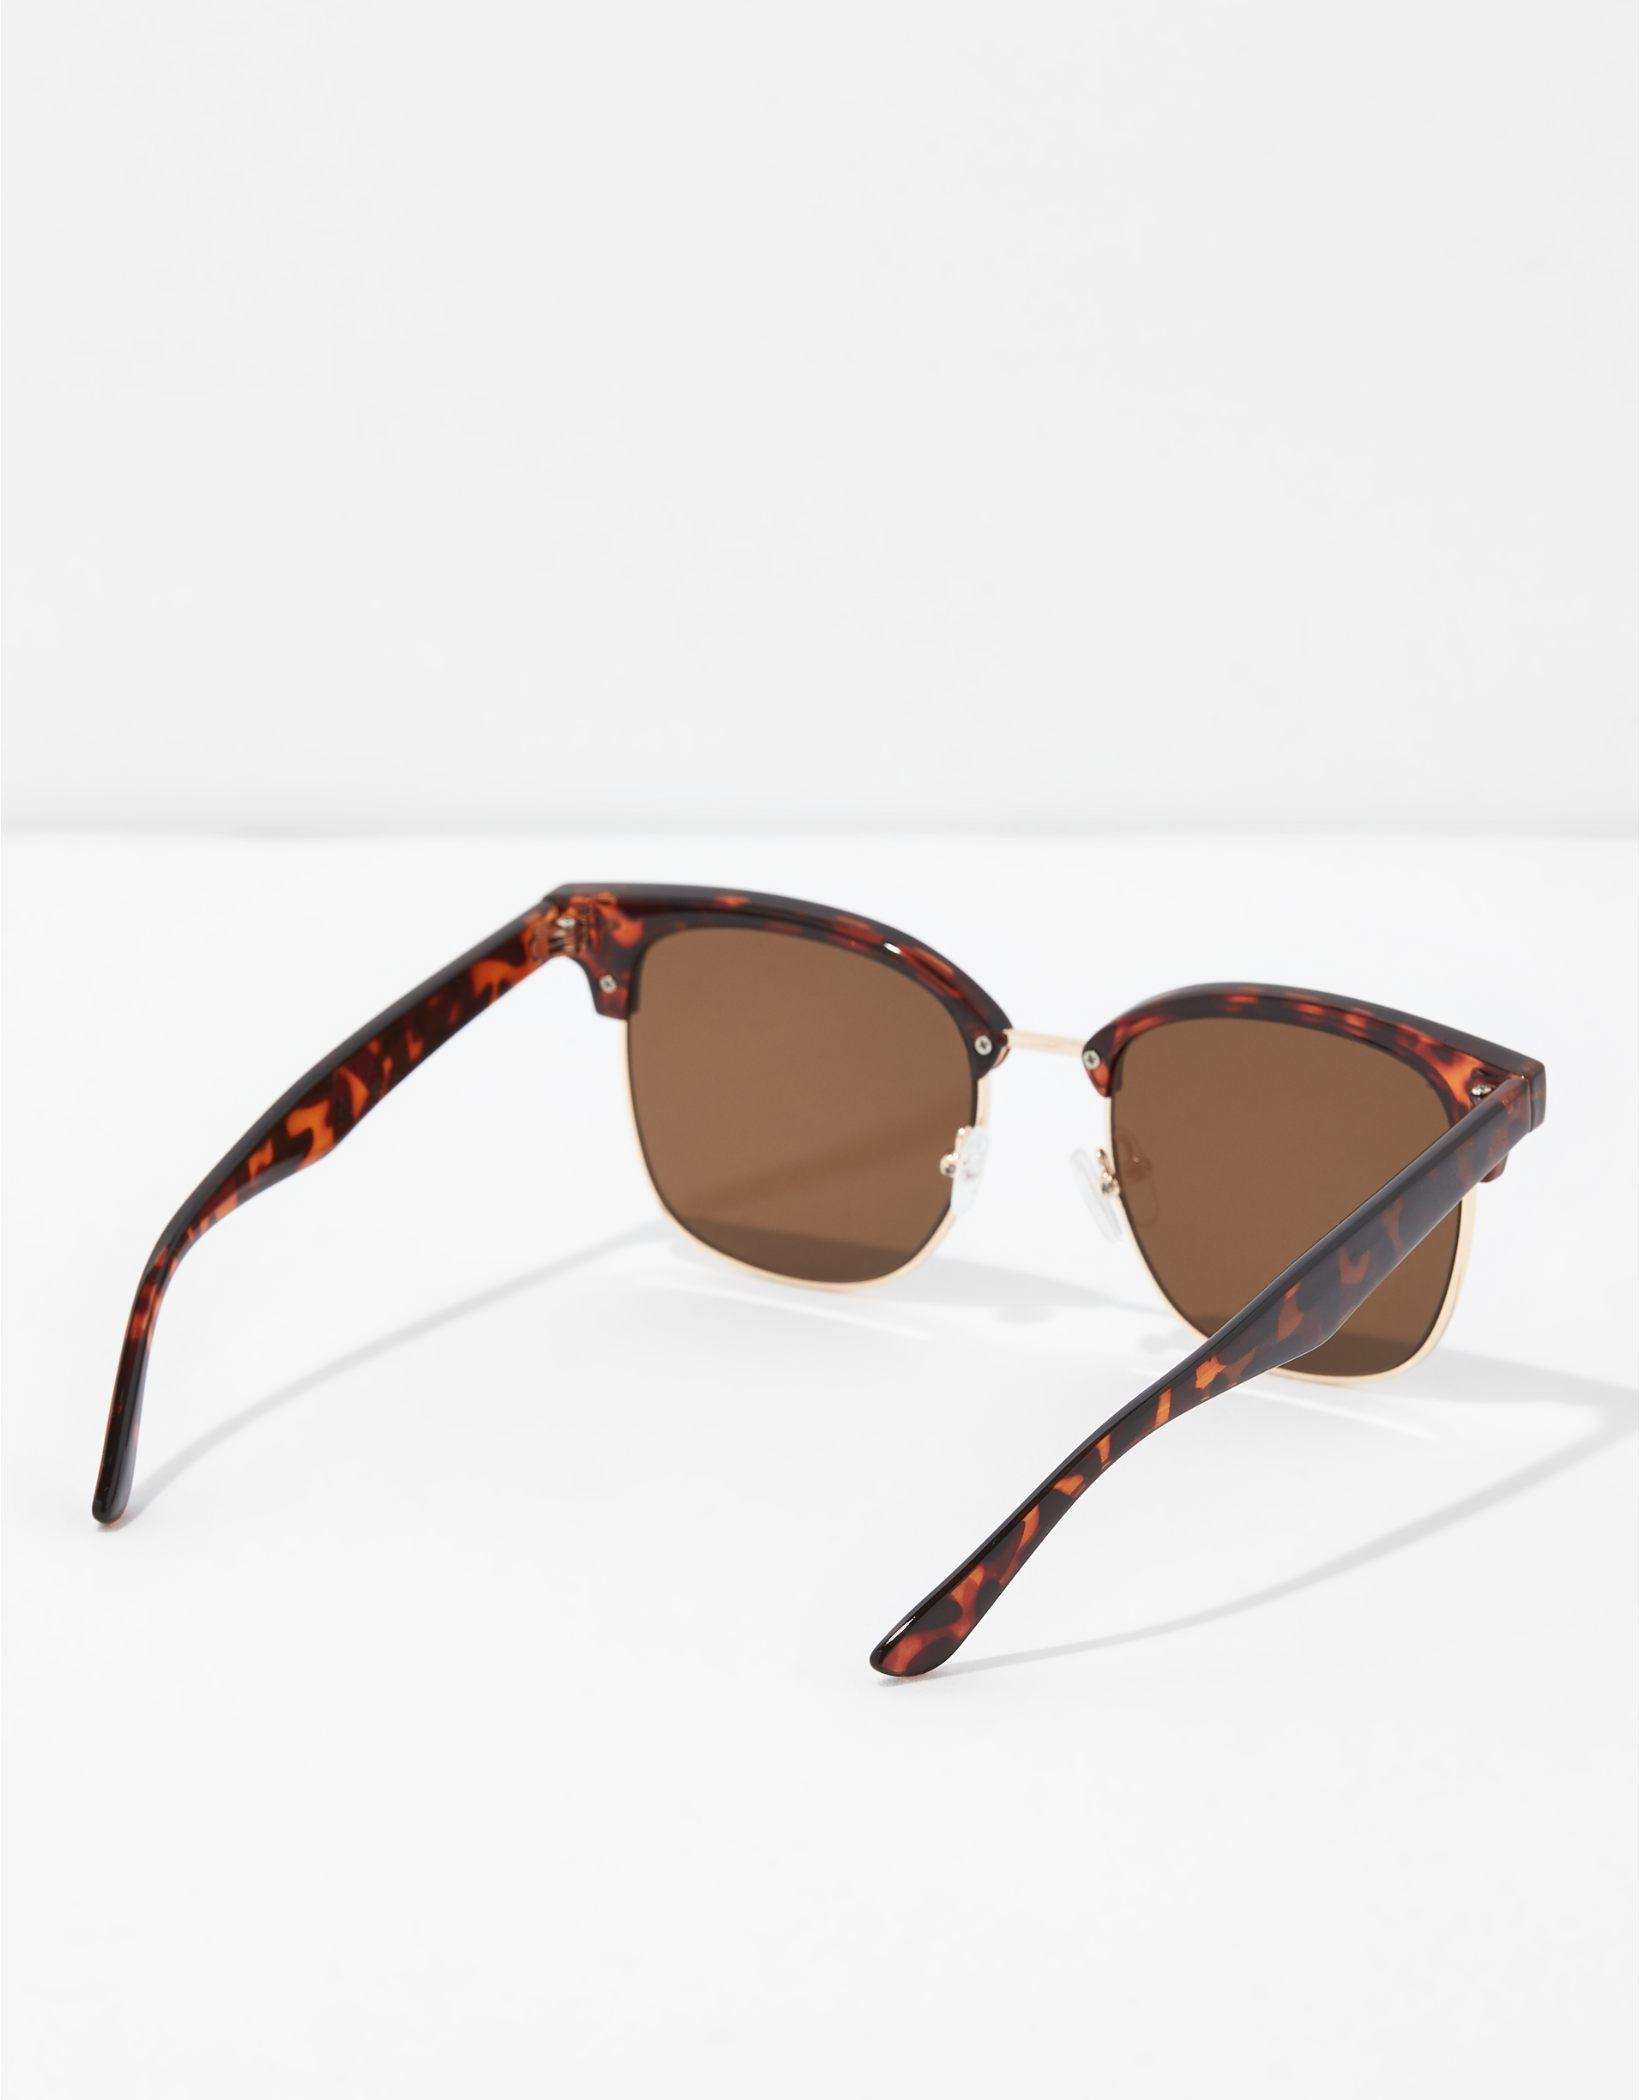 AEO Tortoise Clubmaster Sunglasses